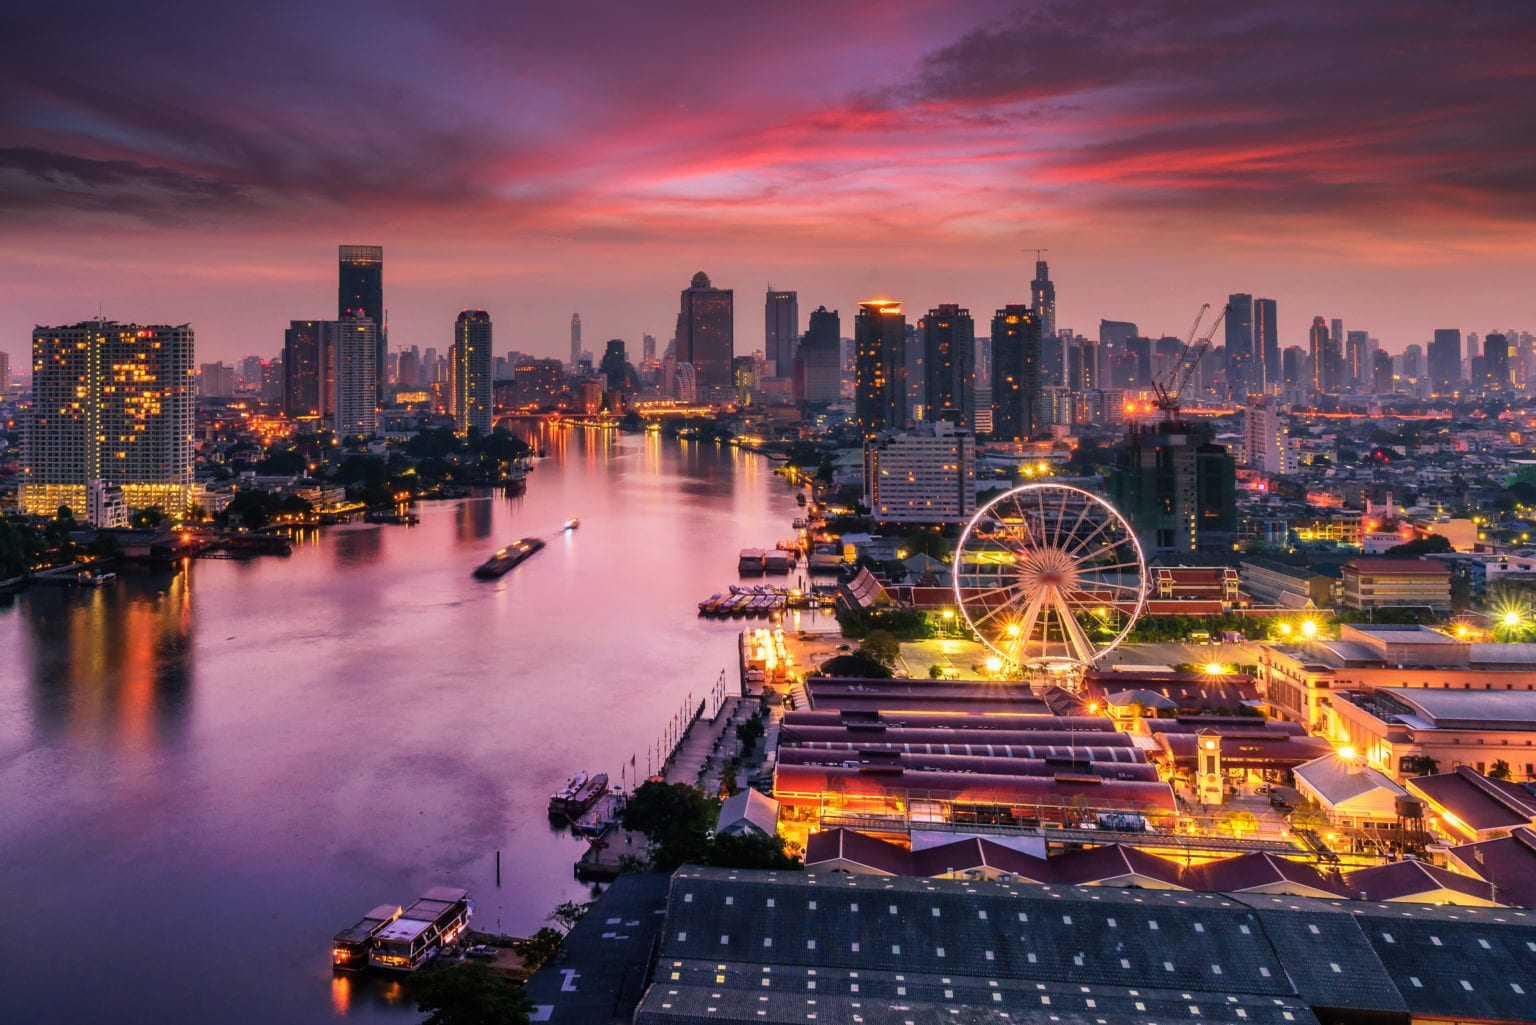 Západ slunce v Bangkoku v Thajsku